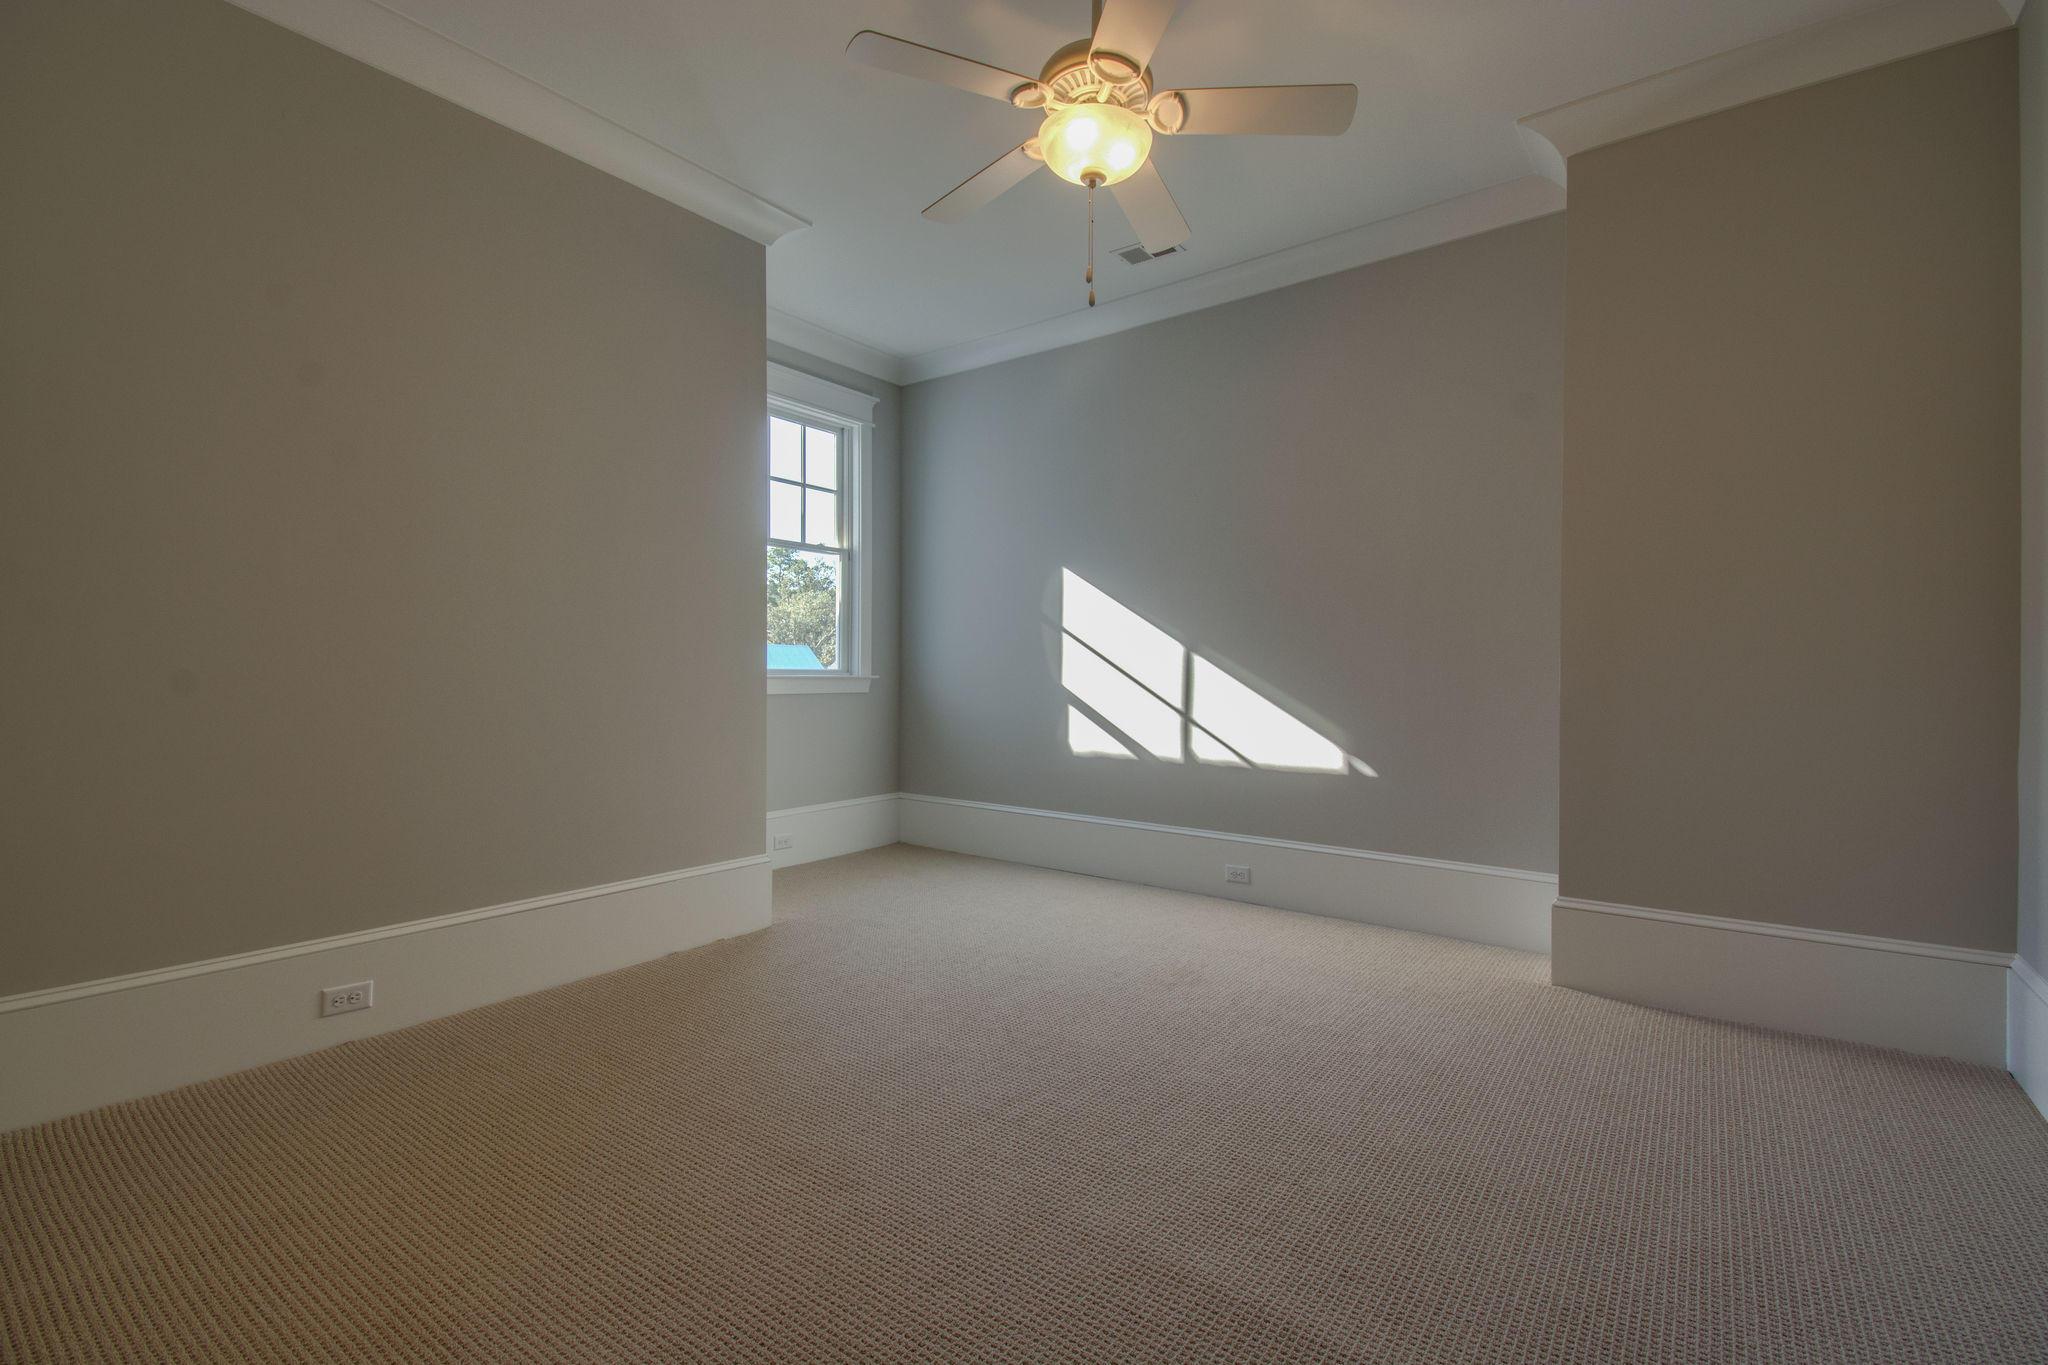 Daniel Island Park Homes For Sale - 112 Brailsford, Charleston, SC - 3